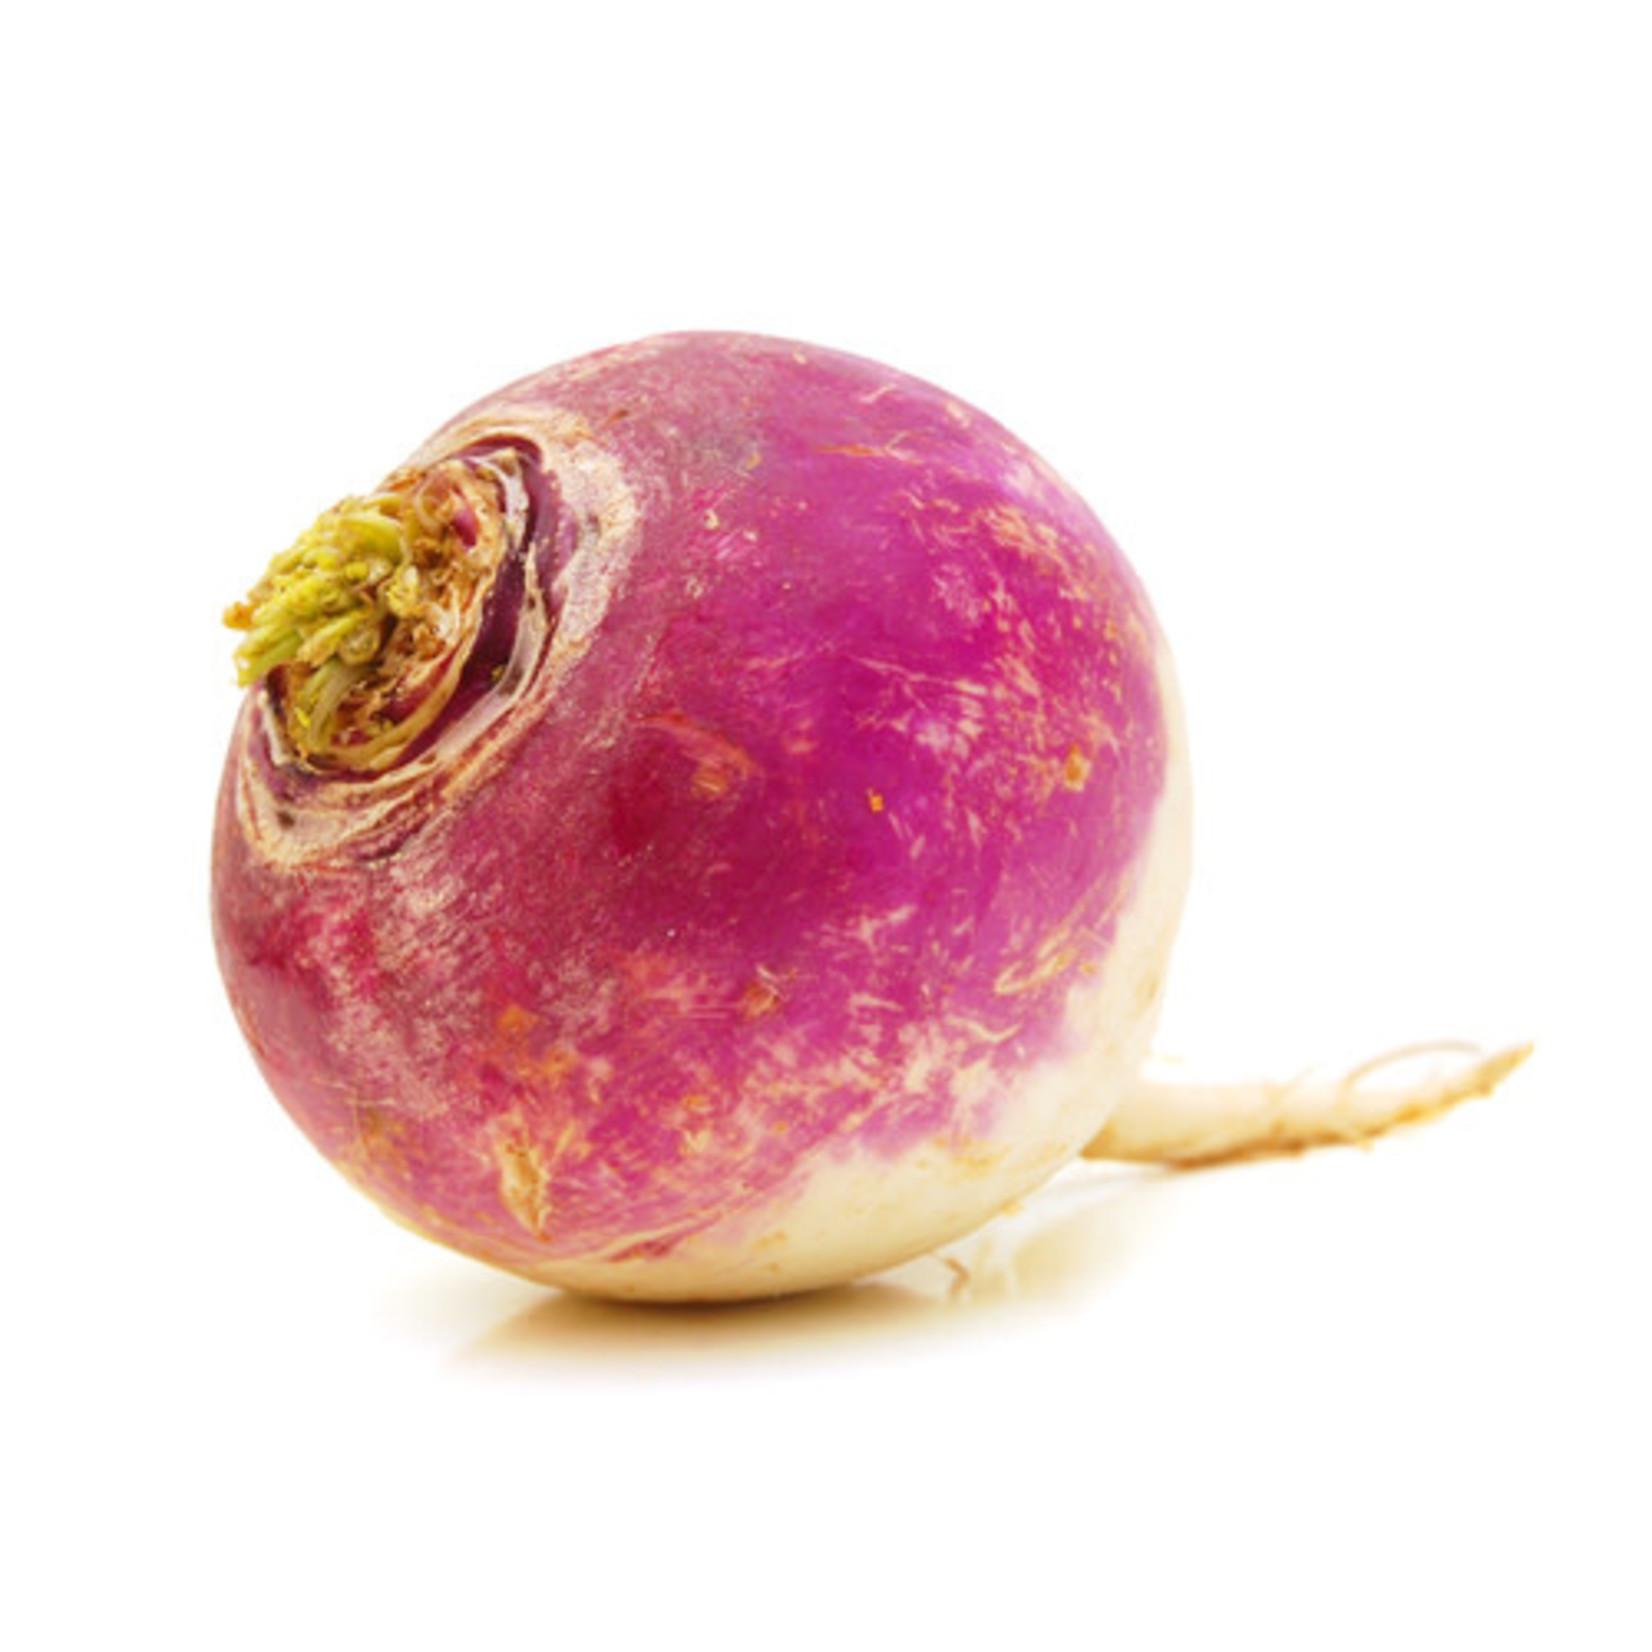 Summer Turnip (seed pkg) - Purple Top W. Globe